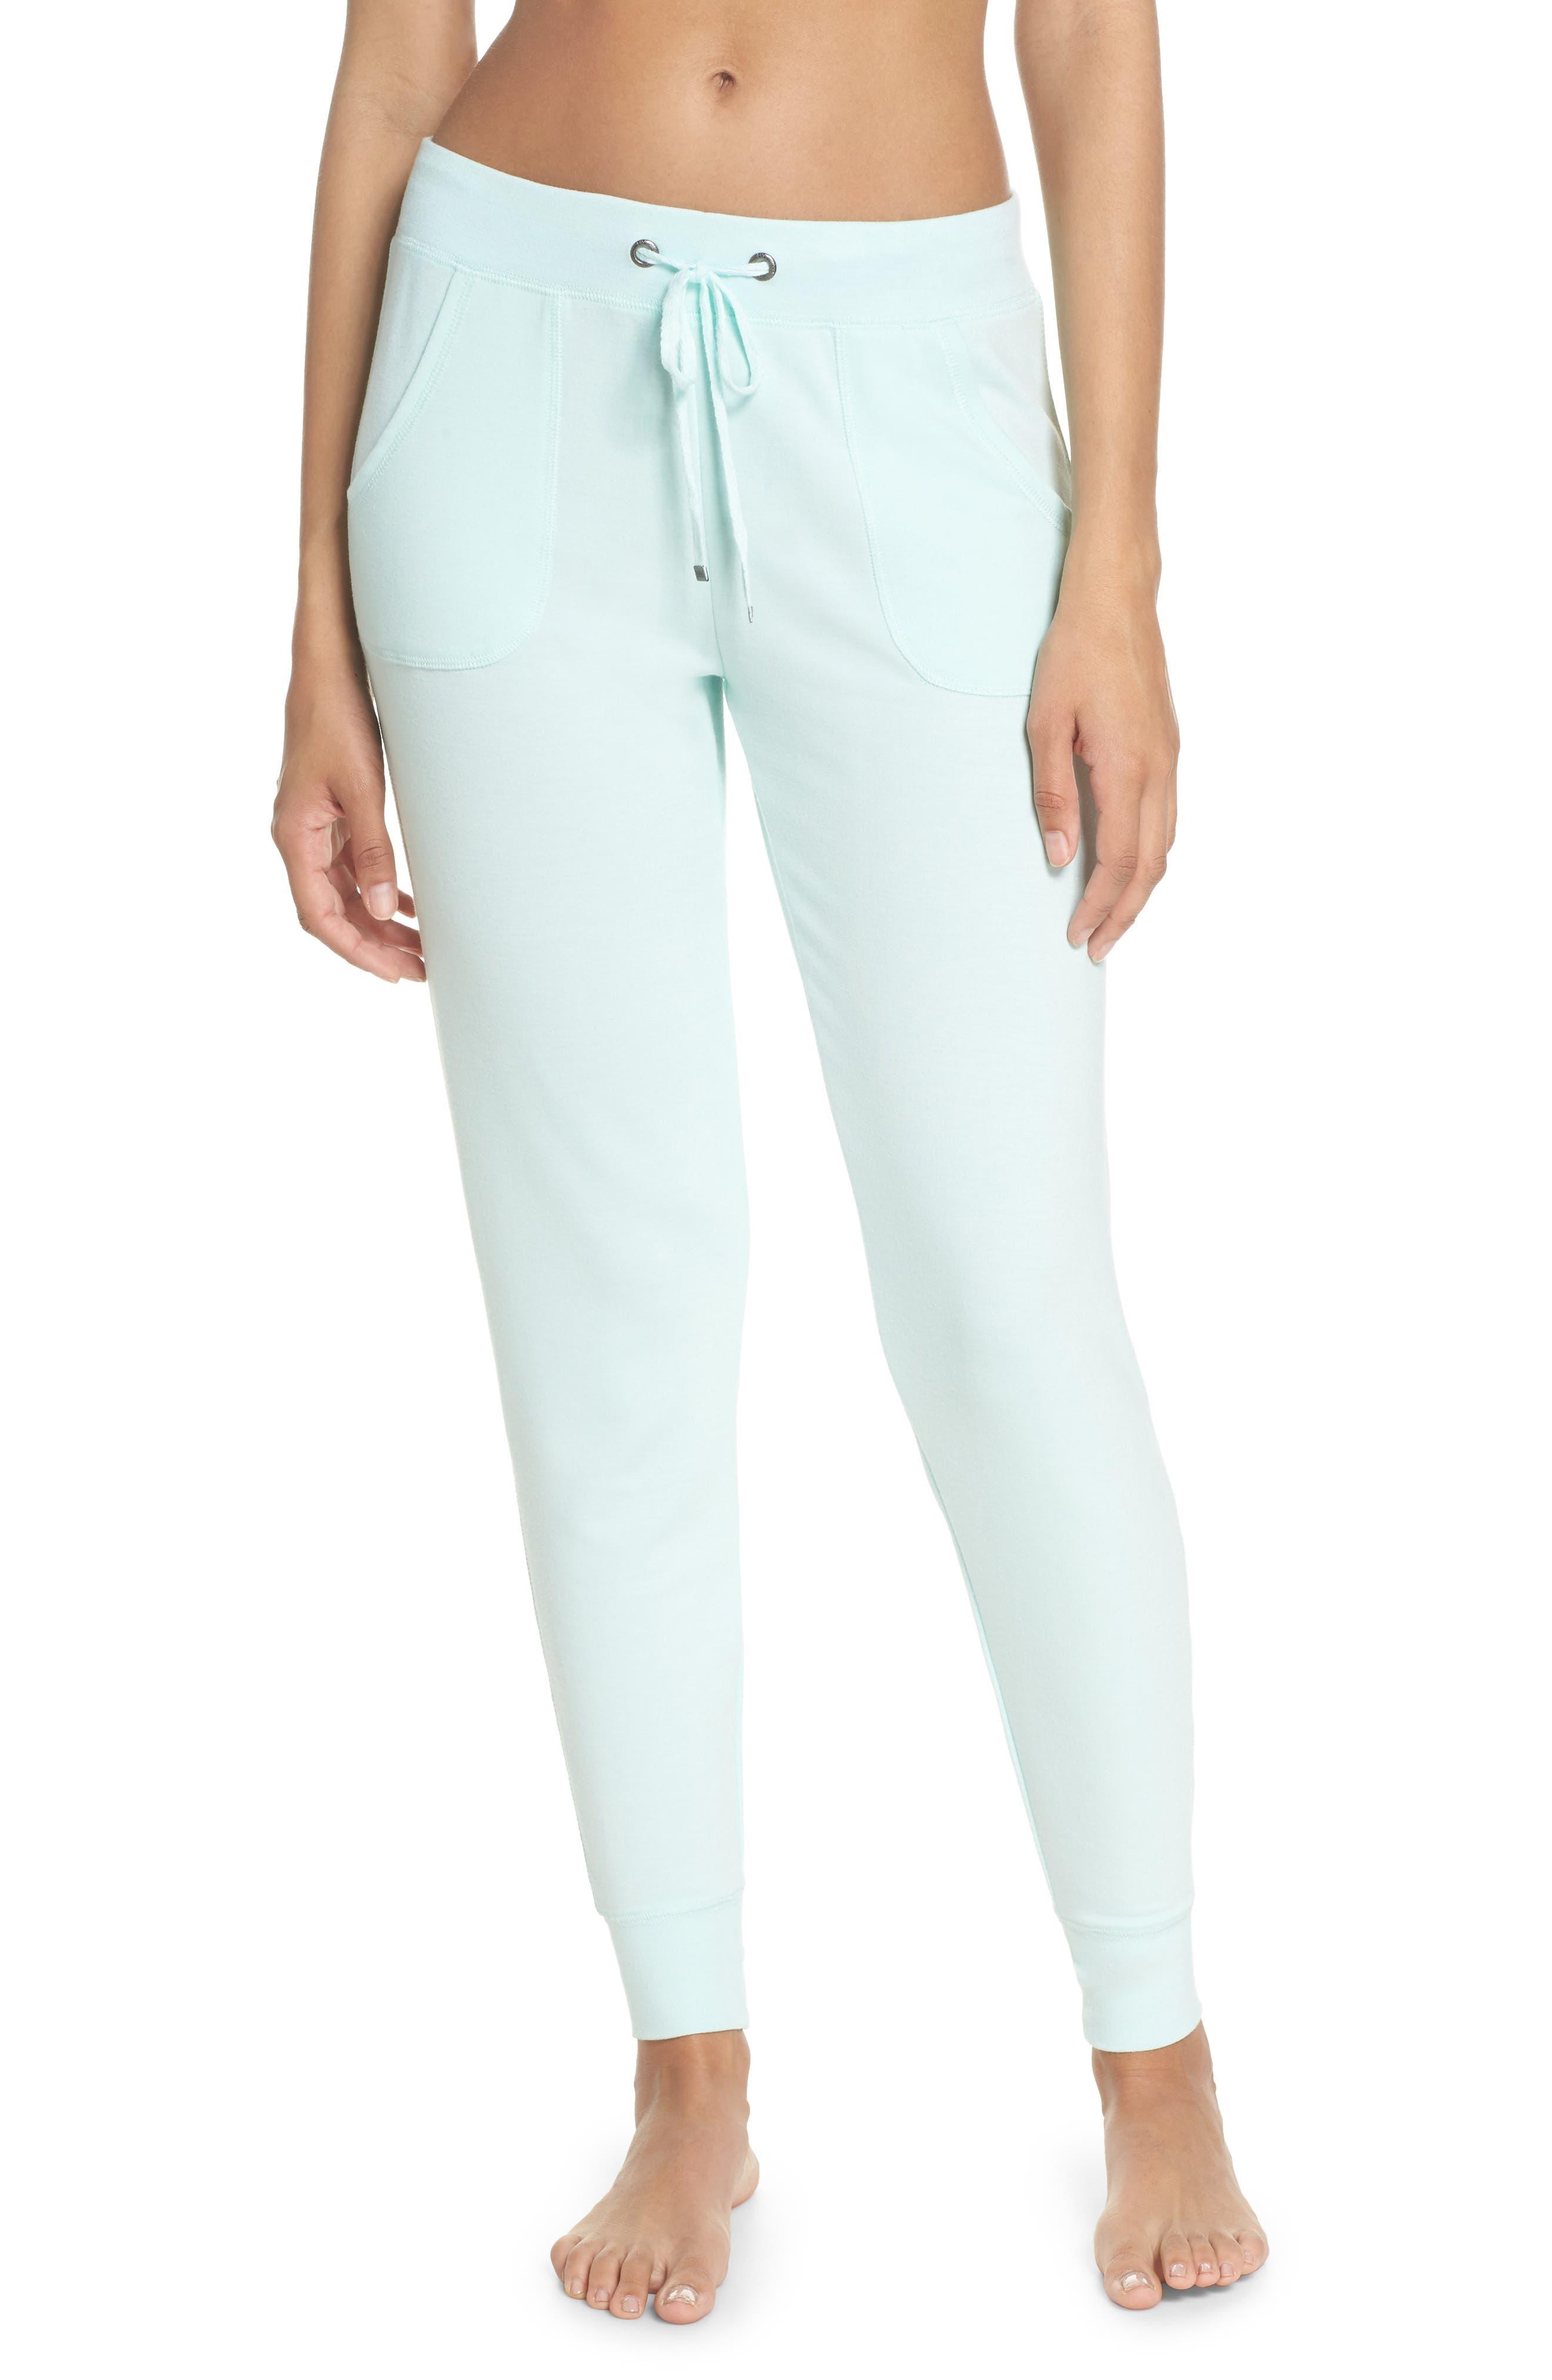 Make + Model All About It Lounge Pants